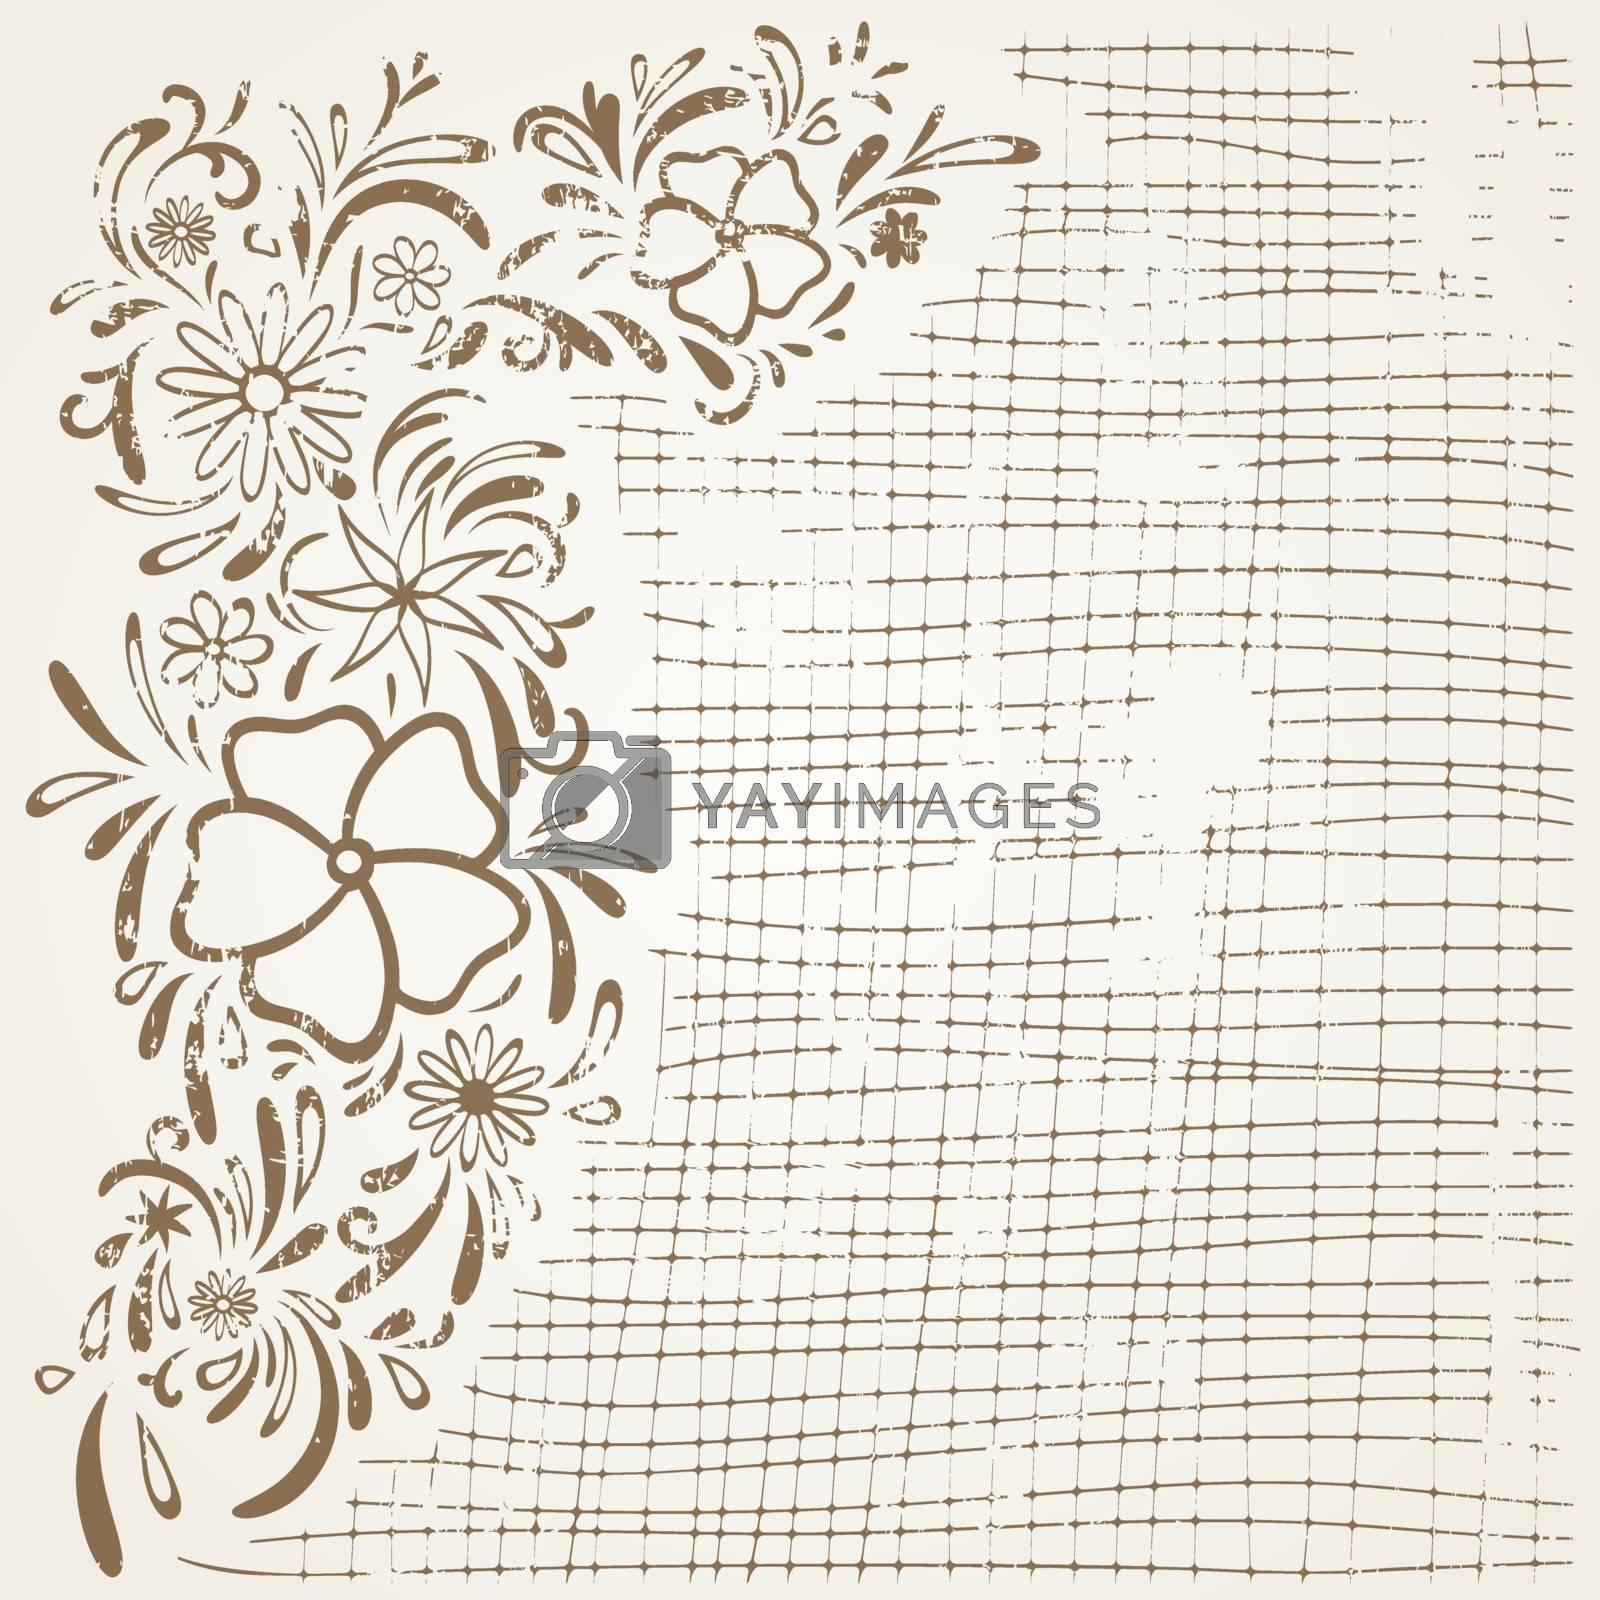 Grunge Vintage Abstract Floral Background